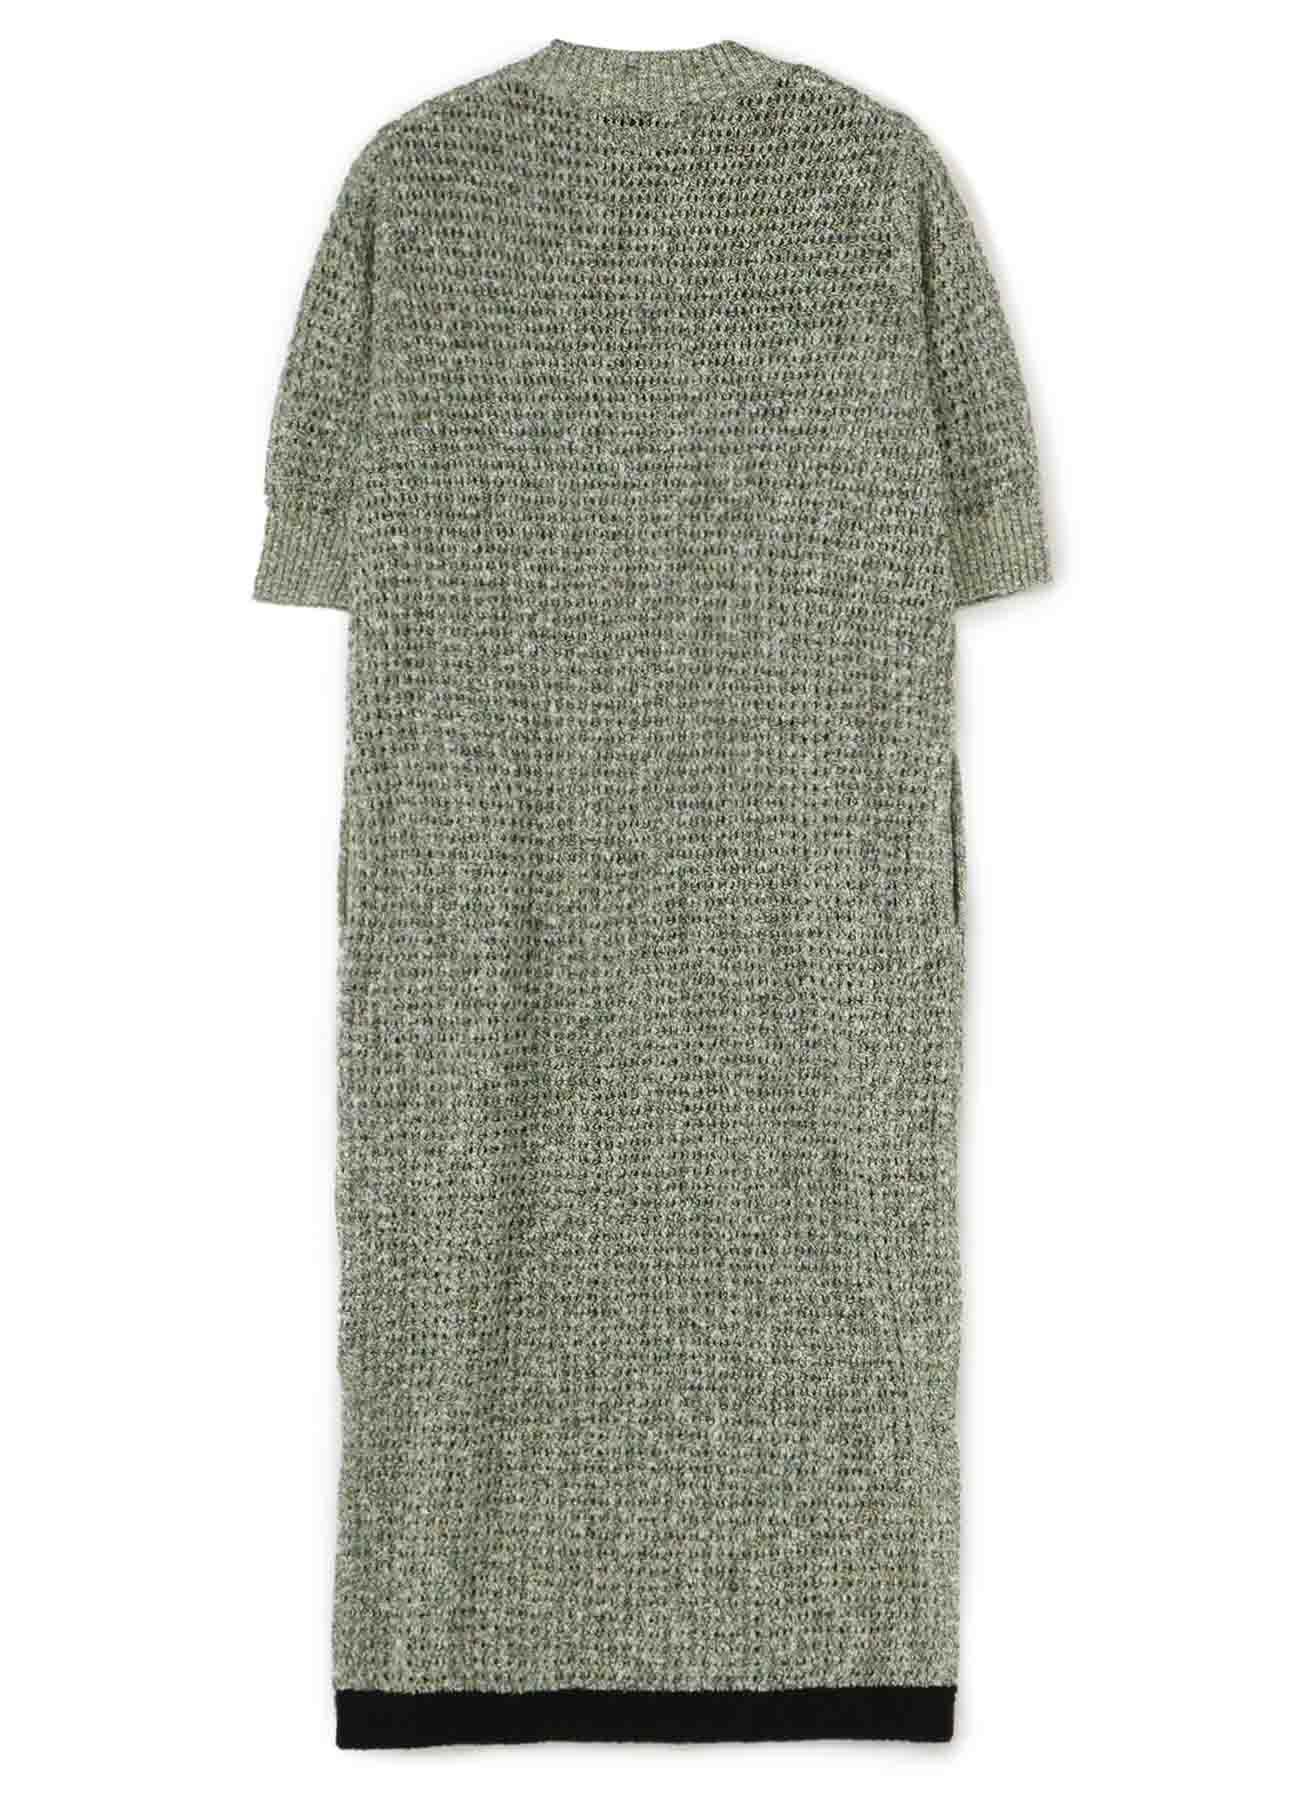 RISMATbyY's RIB COLOURED DRESS